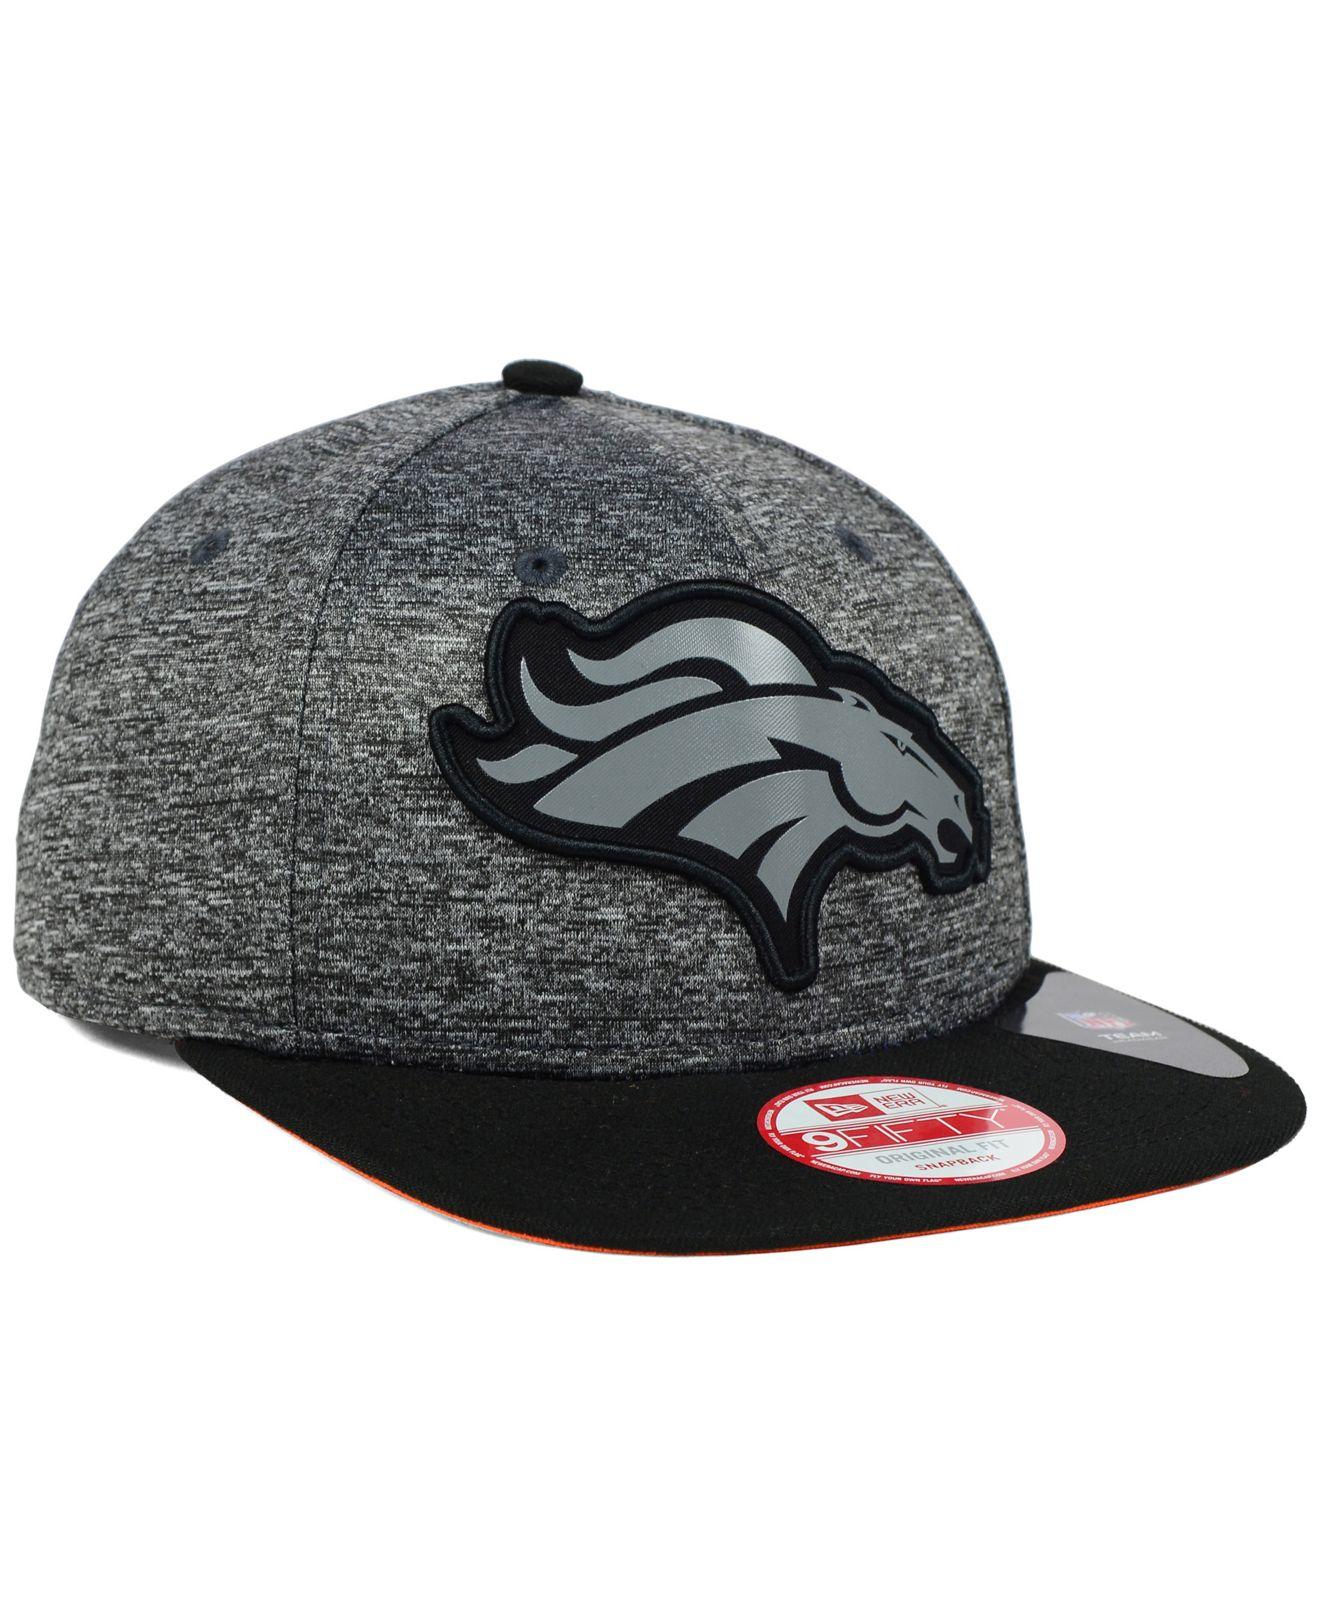 40037f59491 Lyst - KTZ Denver Broncos Gridiron 9fifty Snapback Cap in Gray for Men